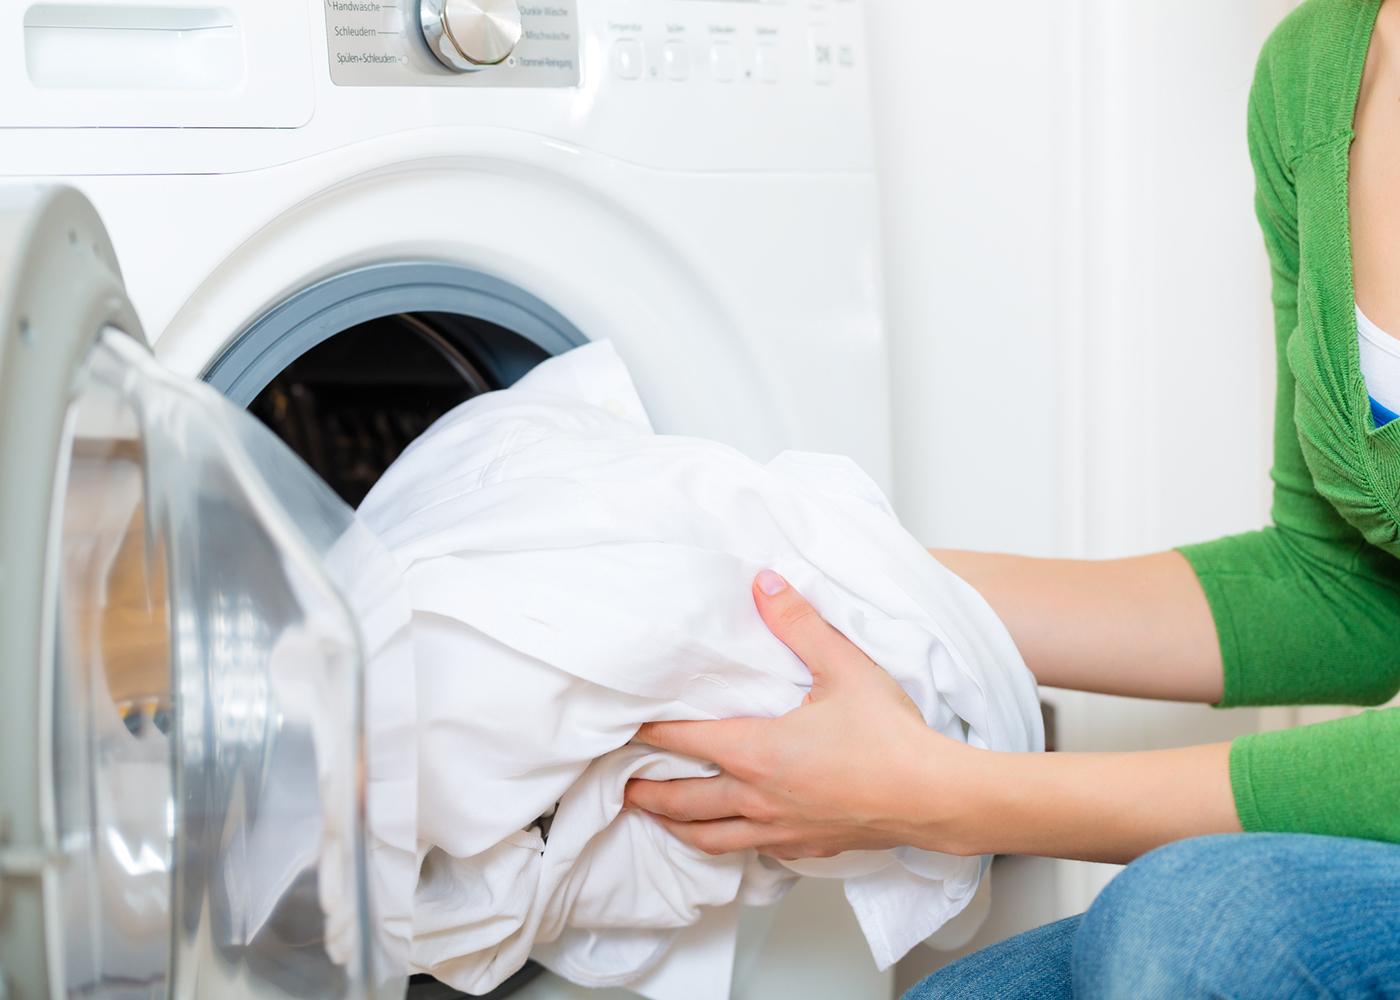 colocar roupa na máquina